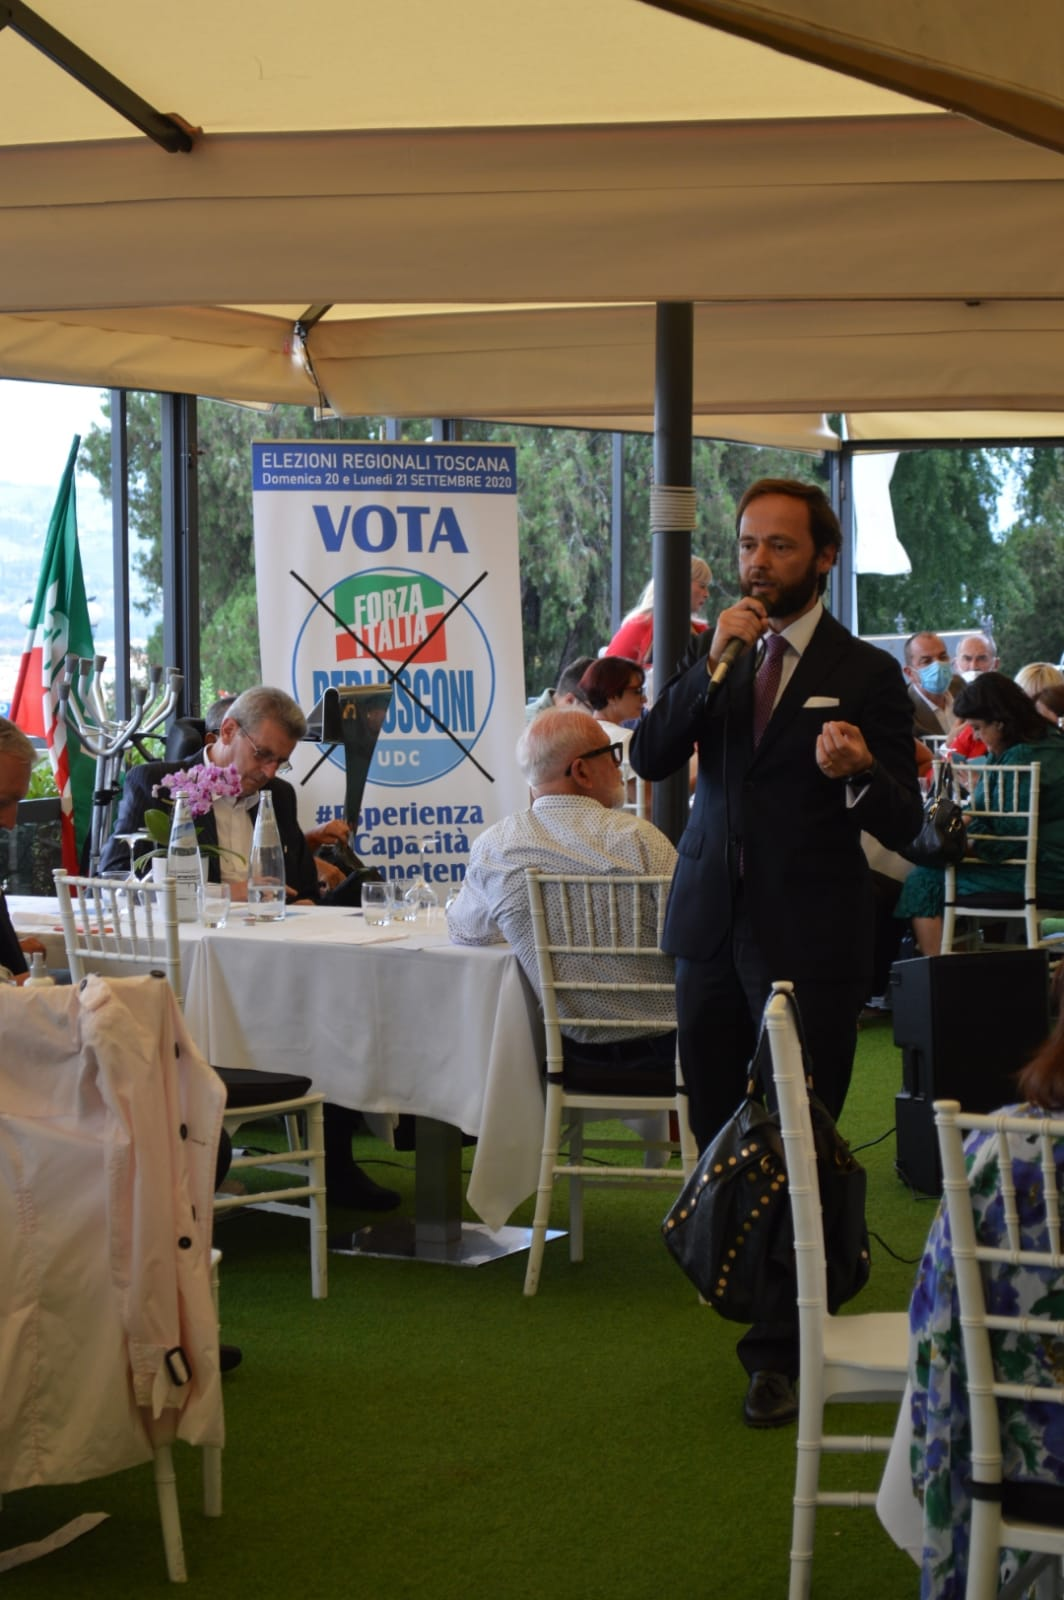 Coordinamento regionale a porte aperte a Firenze 22